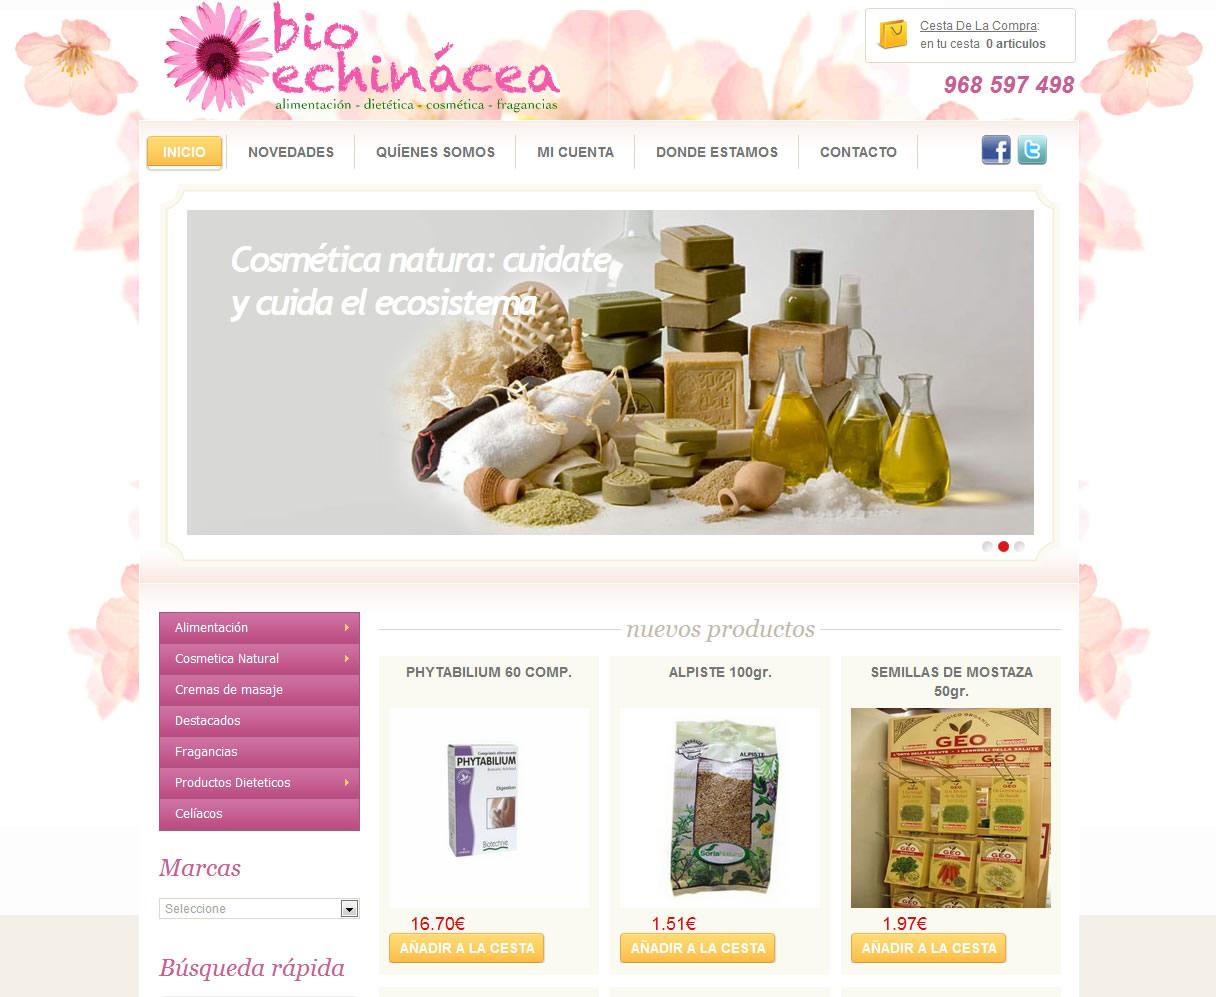 Bioechinacea - Oscommerce